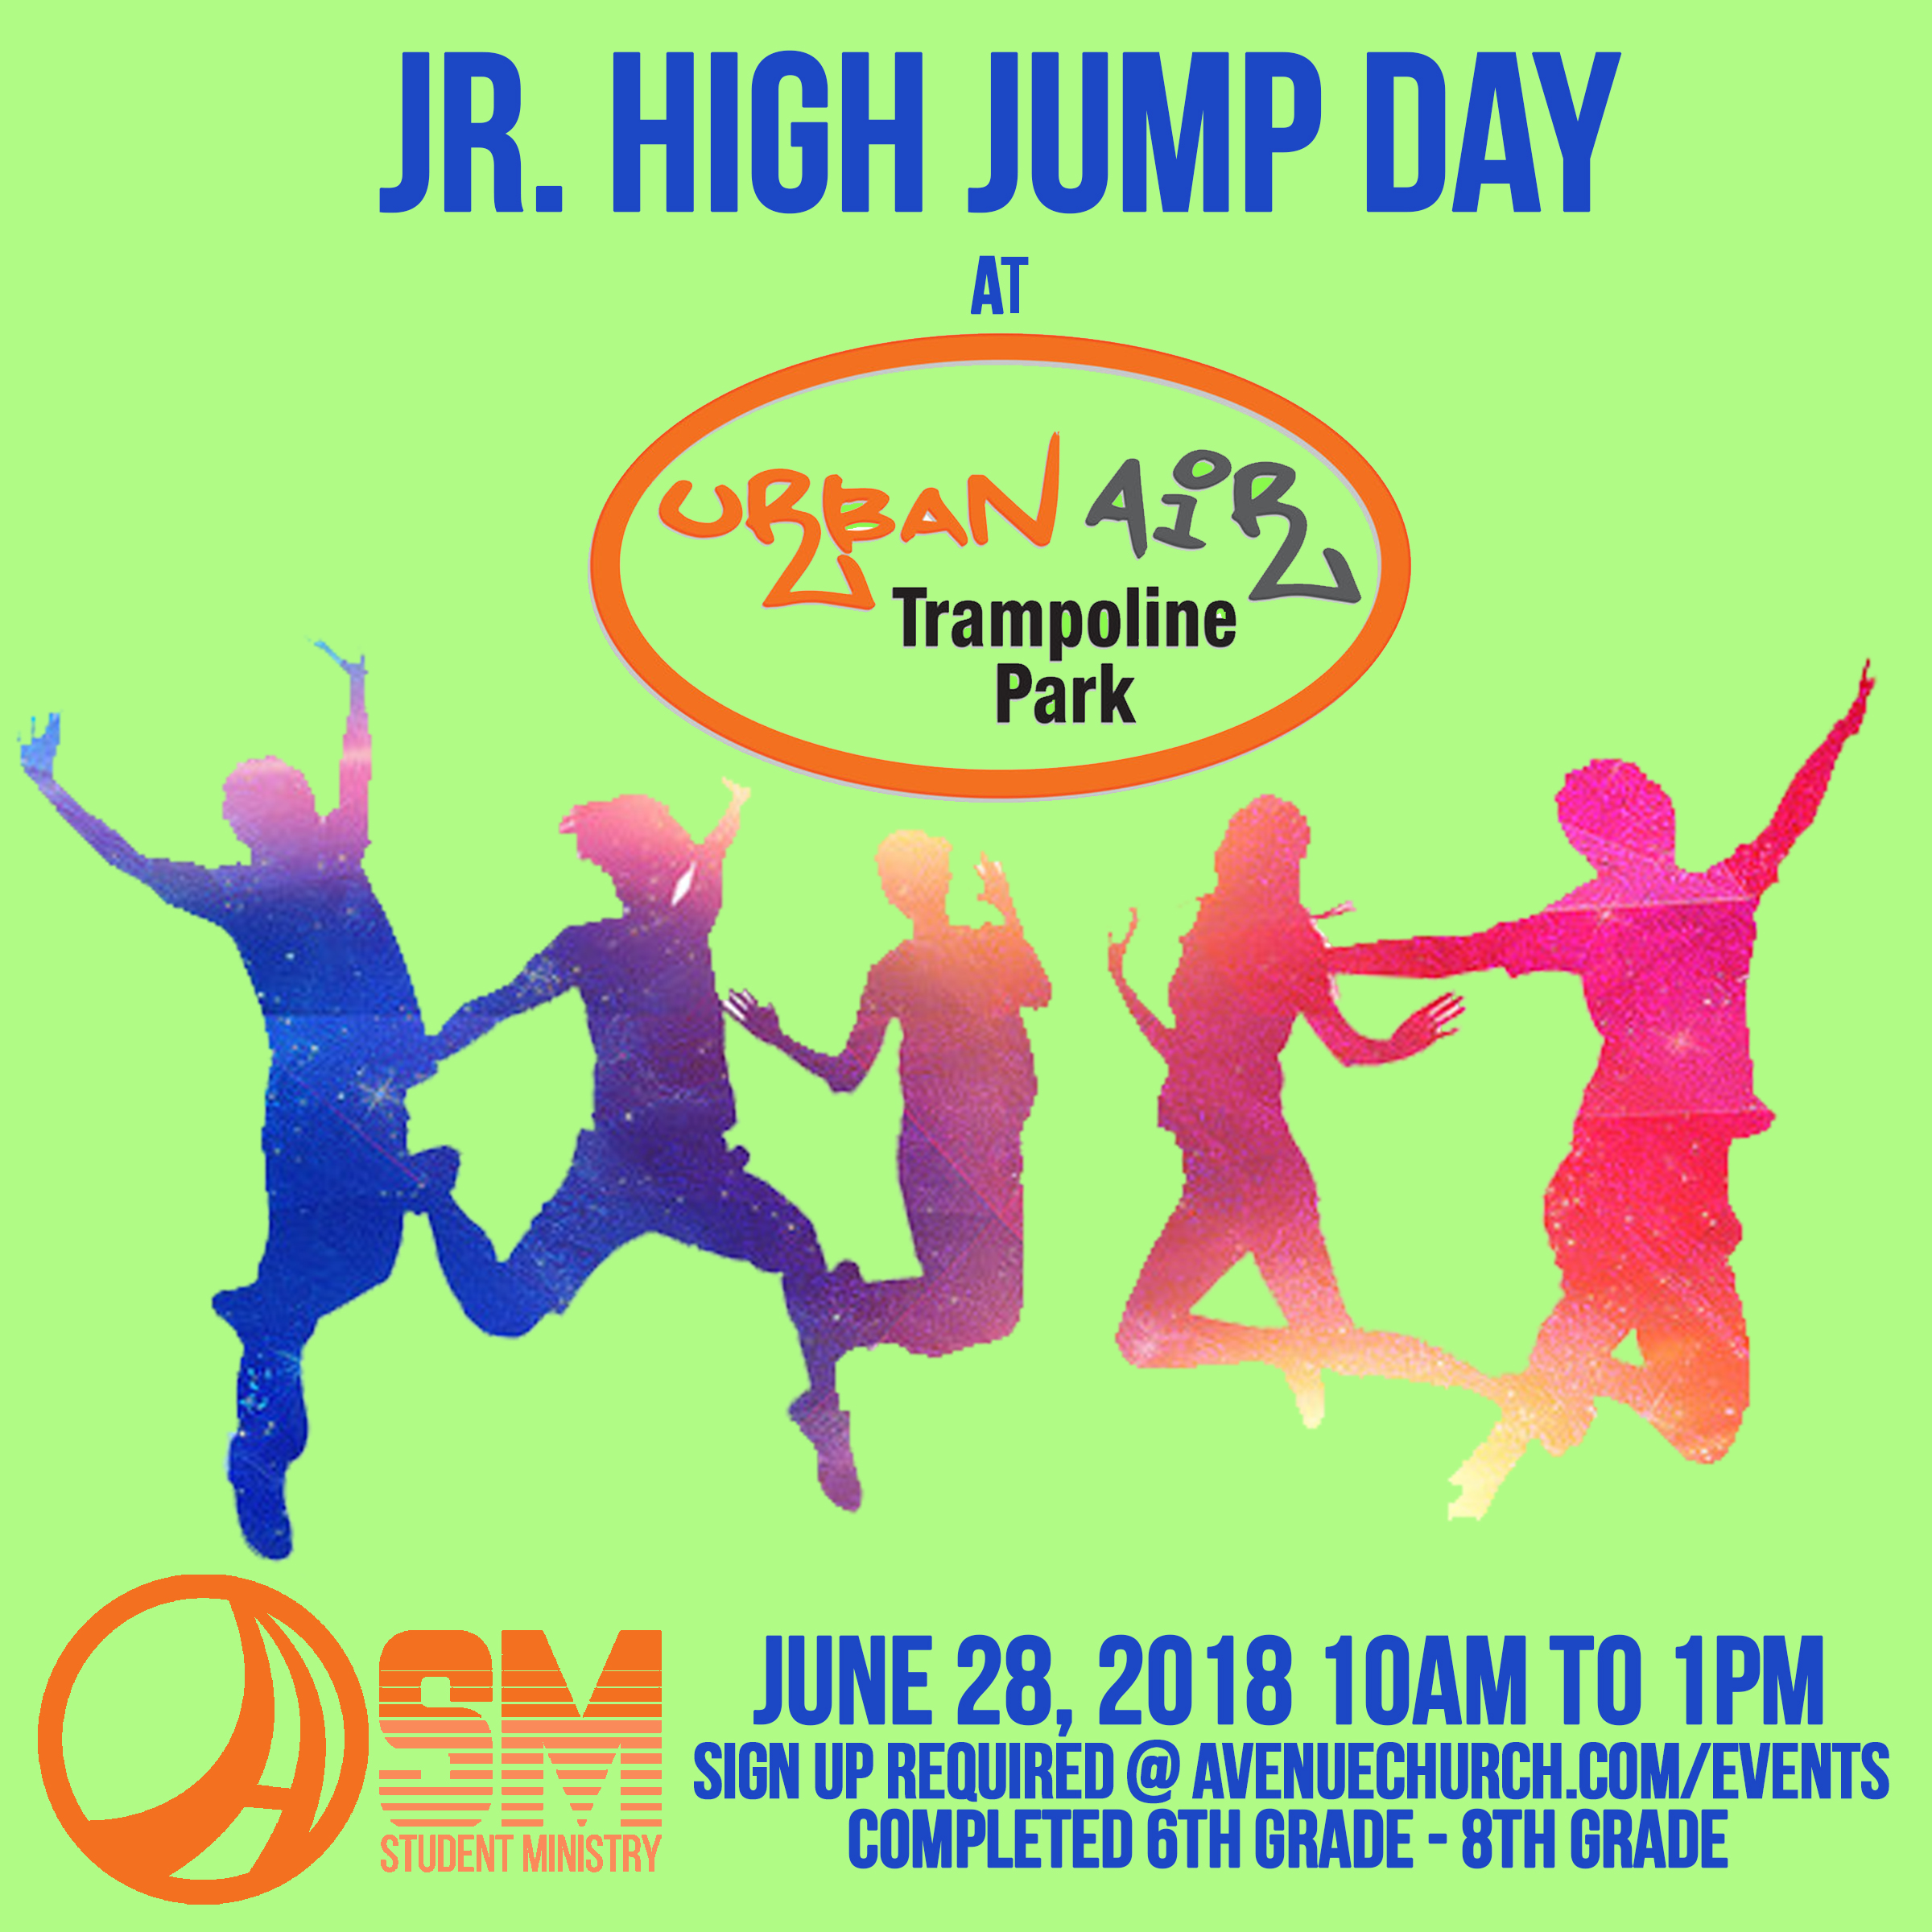 Jr. high jump day